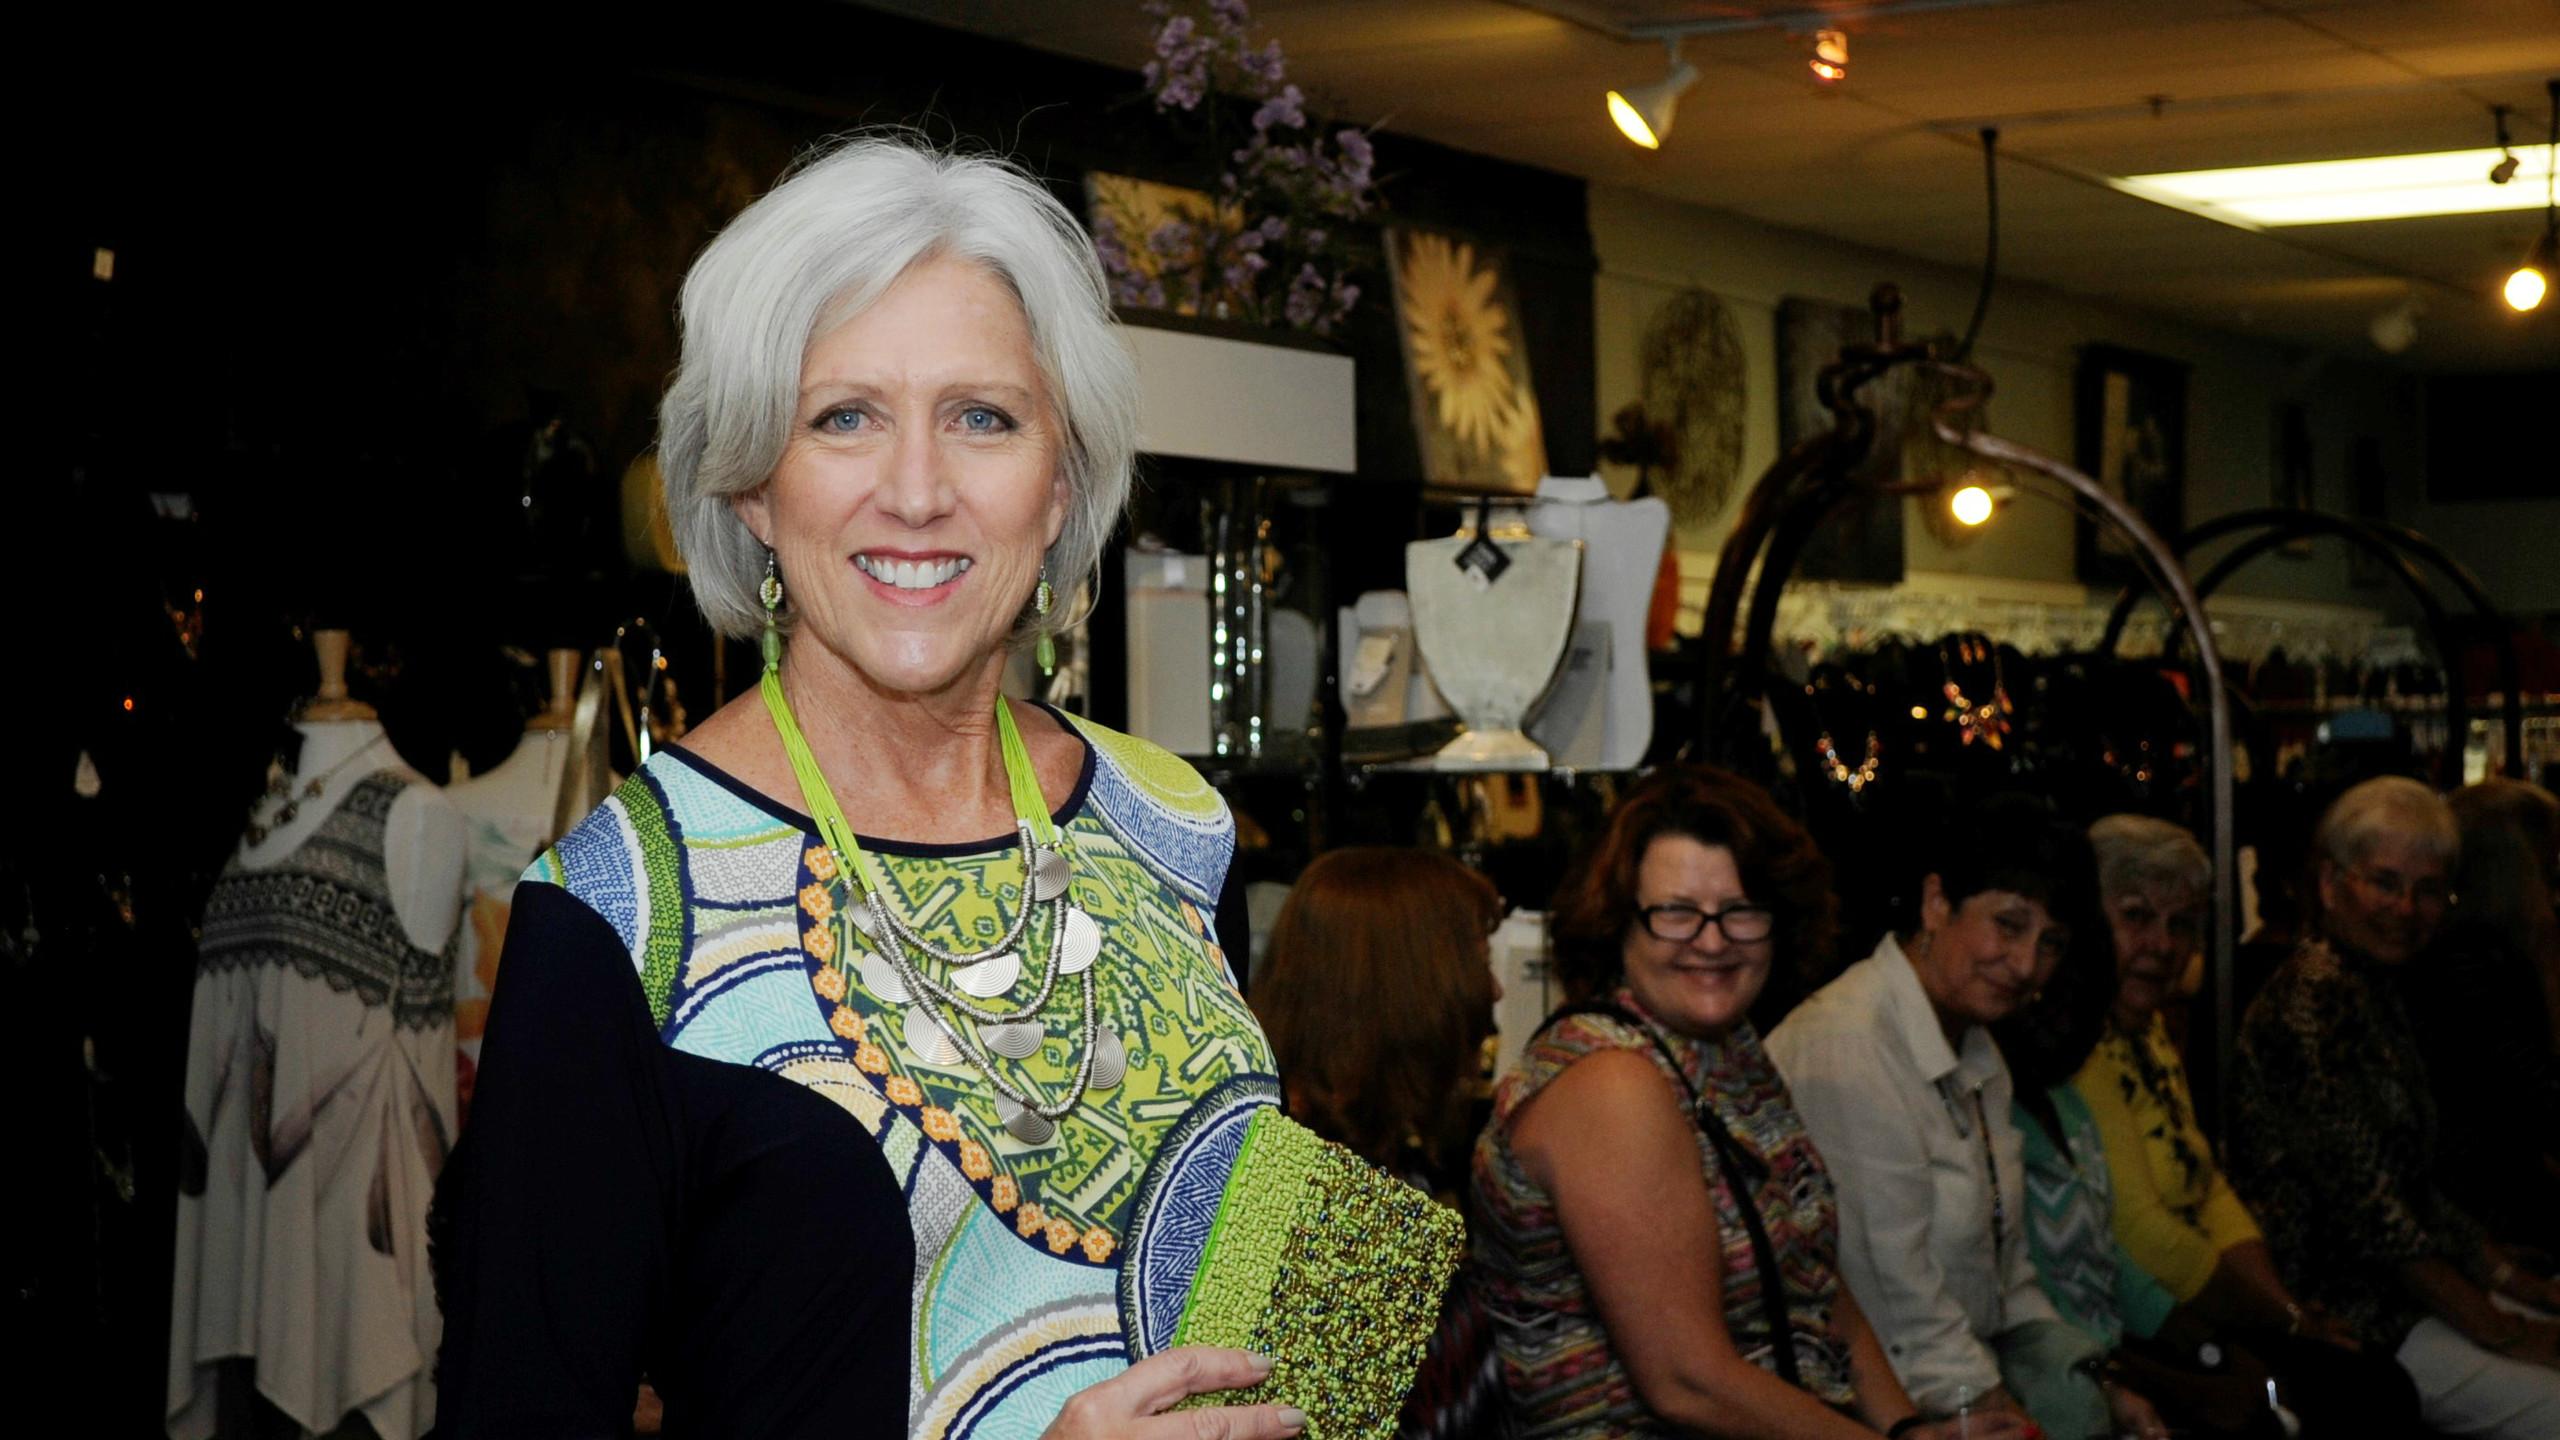 Fashion event in Palm Coast, photo by Tiffany Katz